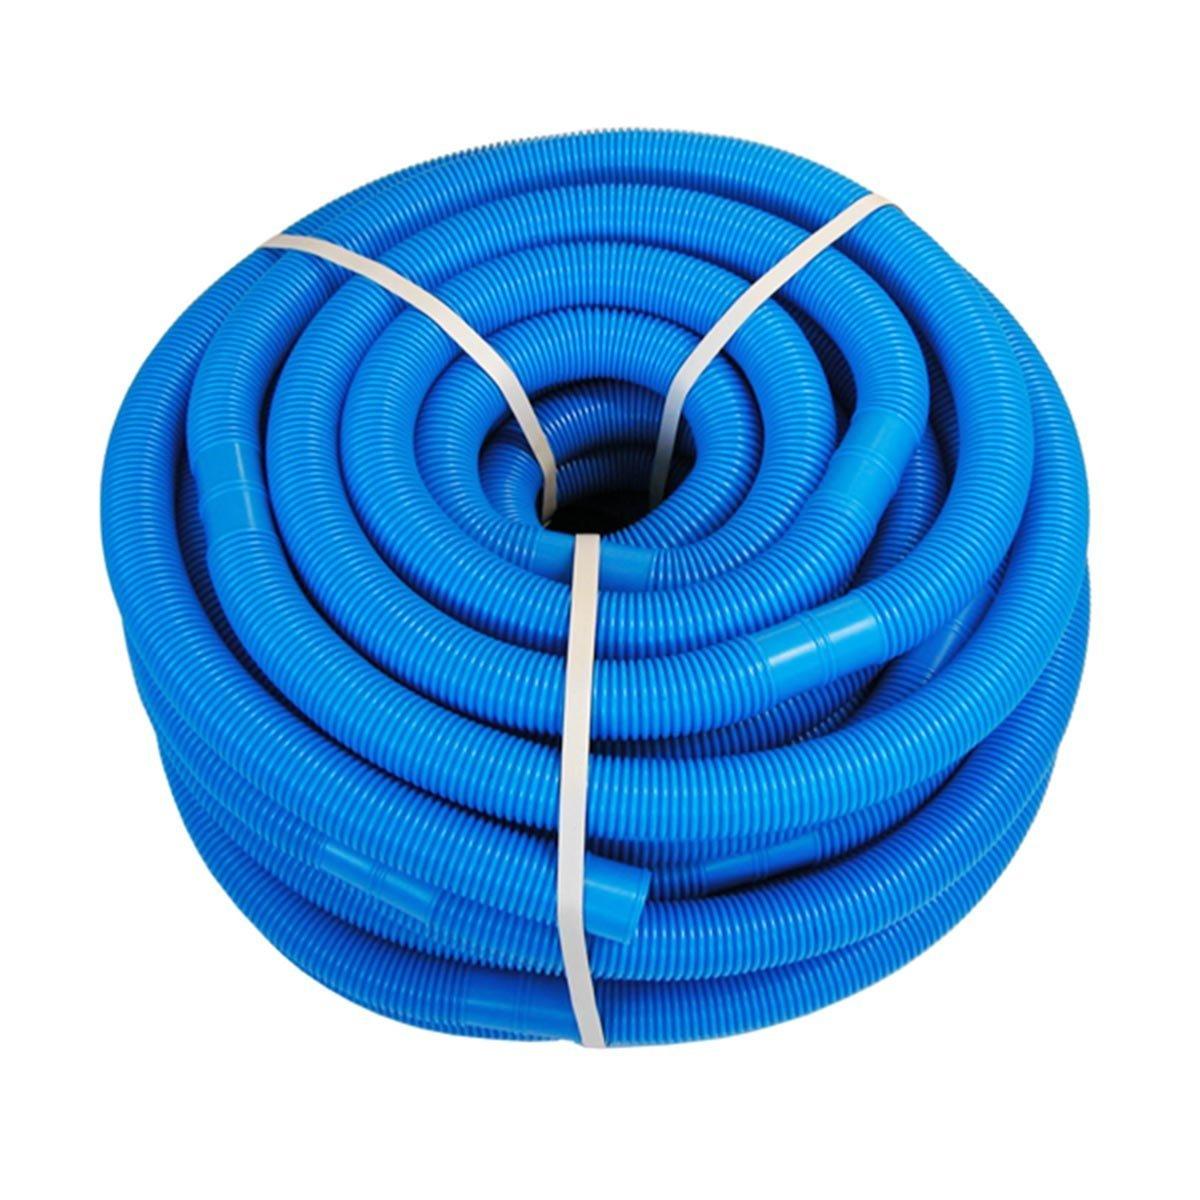 Manguera en rollo de 50 m de 32 mm de diámetro para piscinas por 1,40€